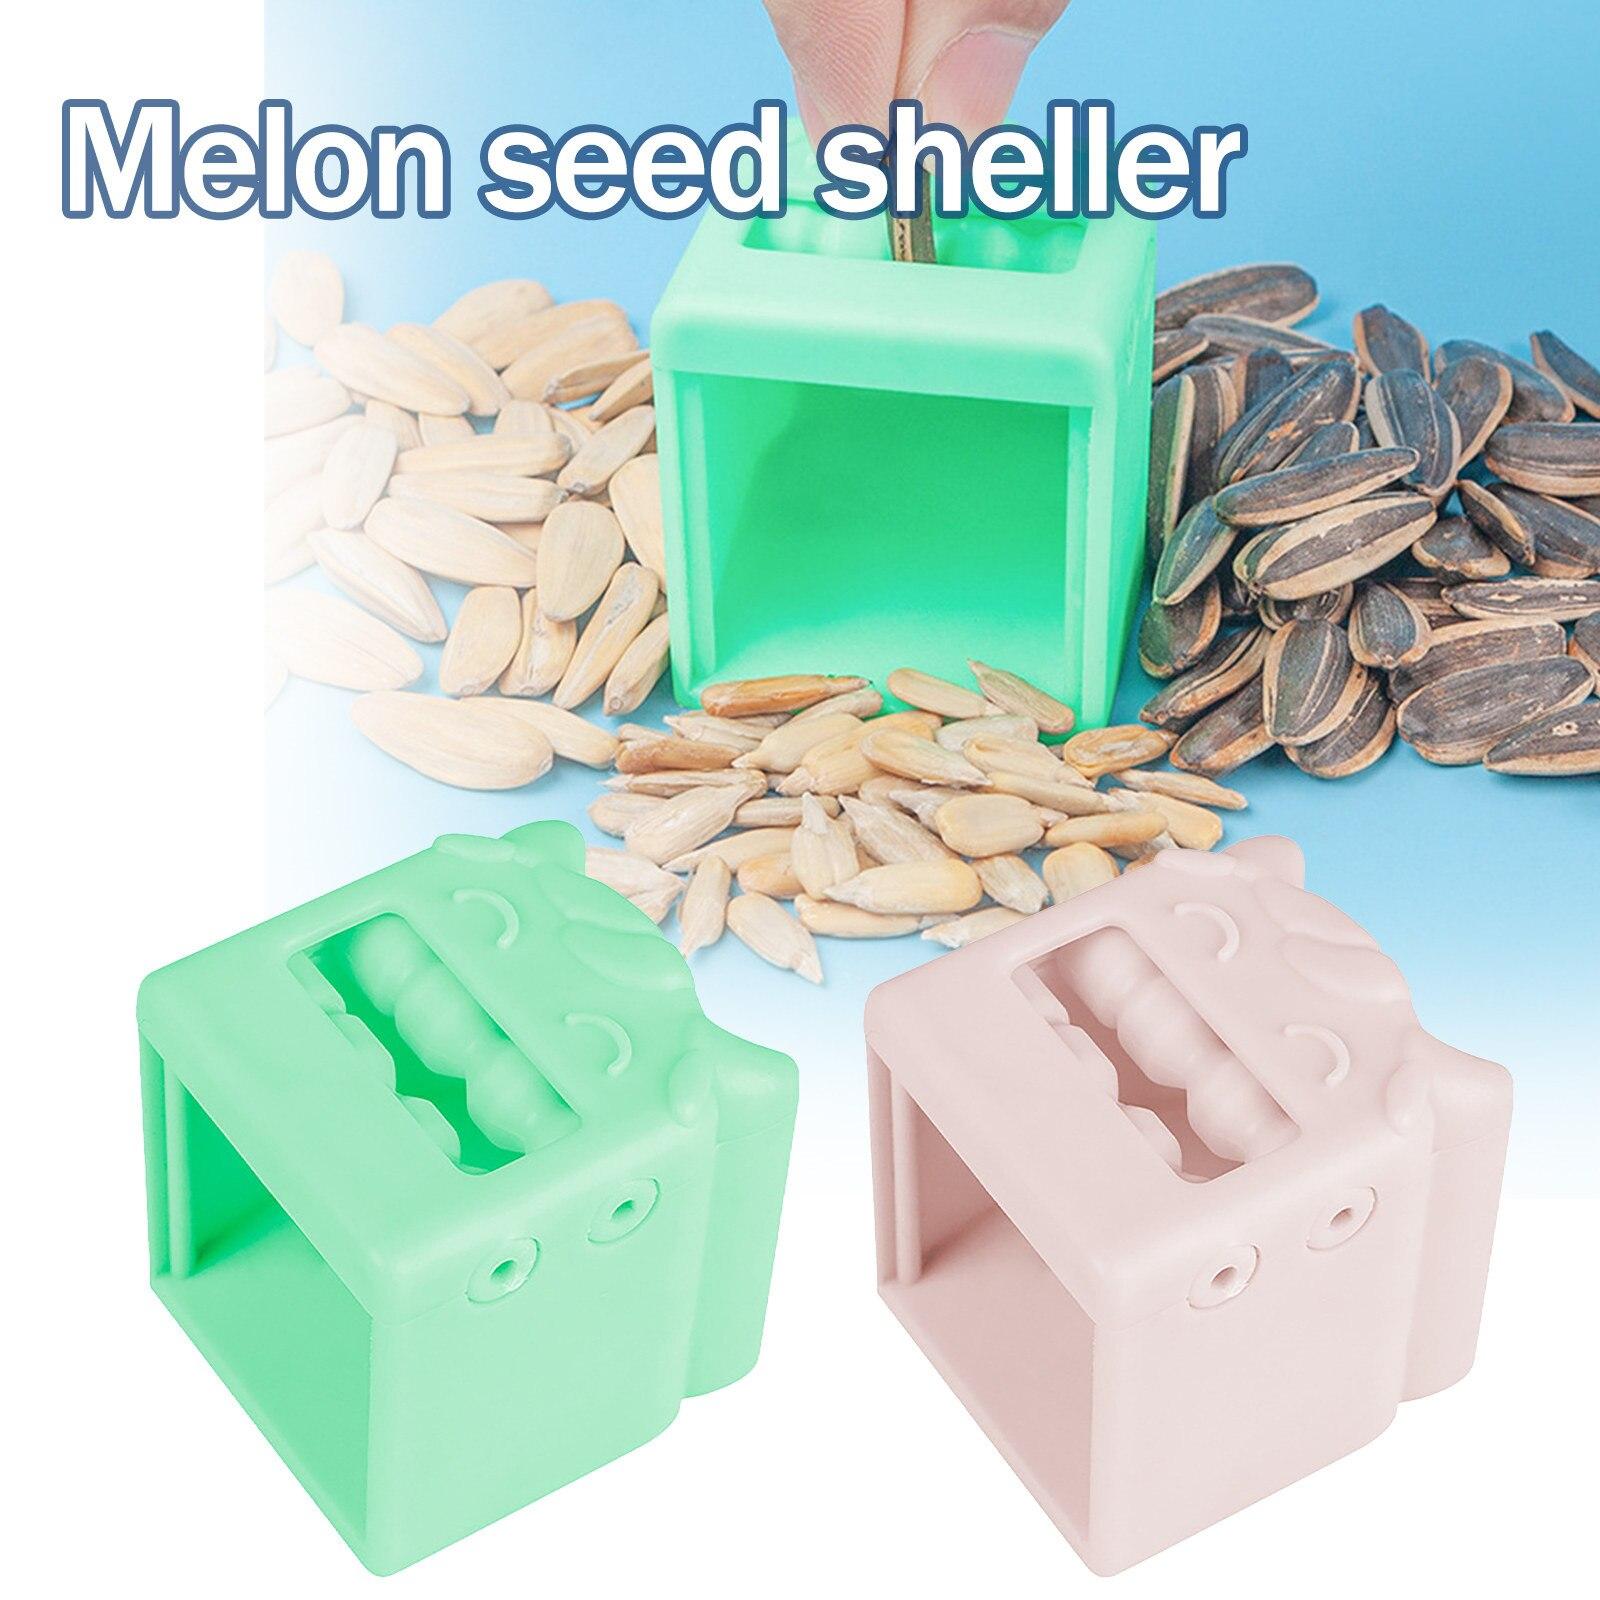 Melon Seed Shelling Lazy Artifact 4.6*4.5*4.8cm Sunflower Seed Peeler Machine Automatic Opener Nutcracker House Kitchen Gadget